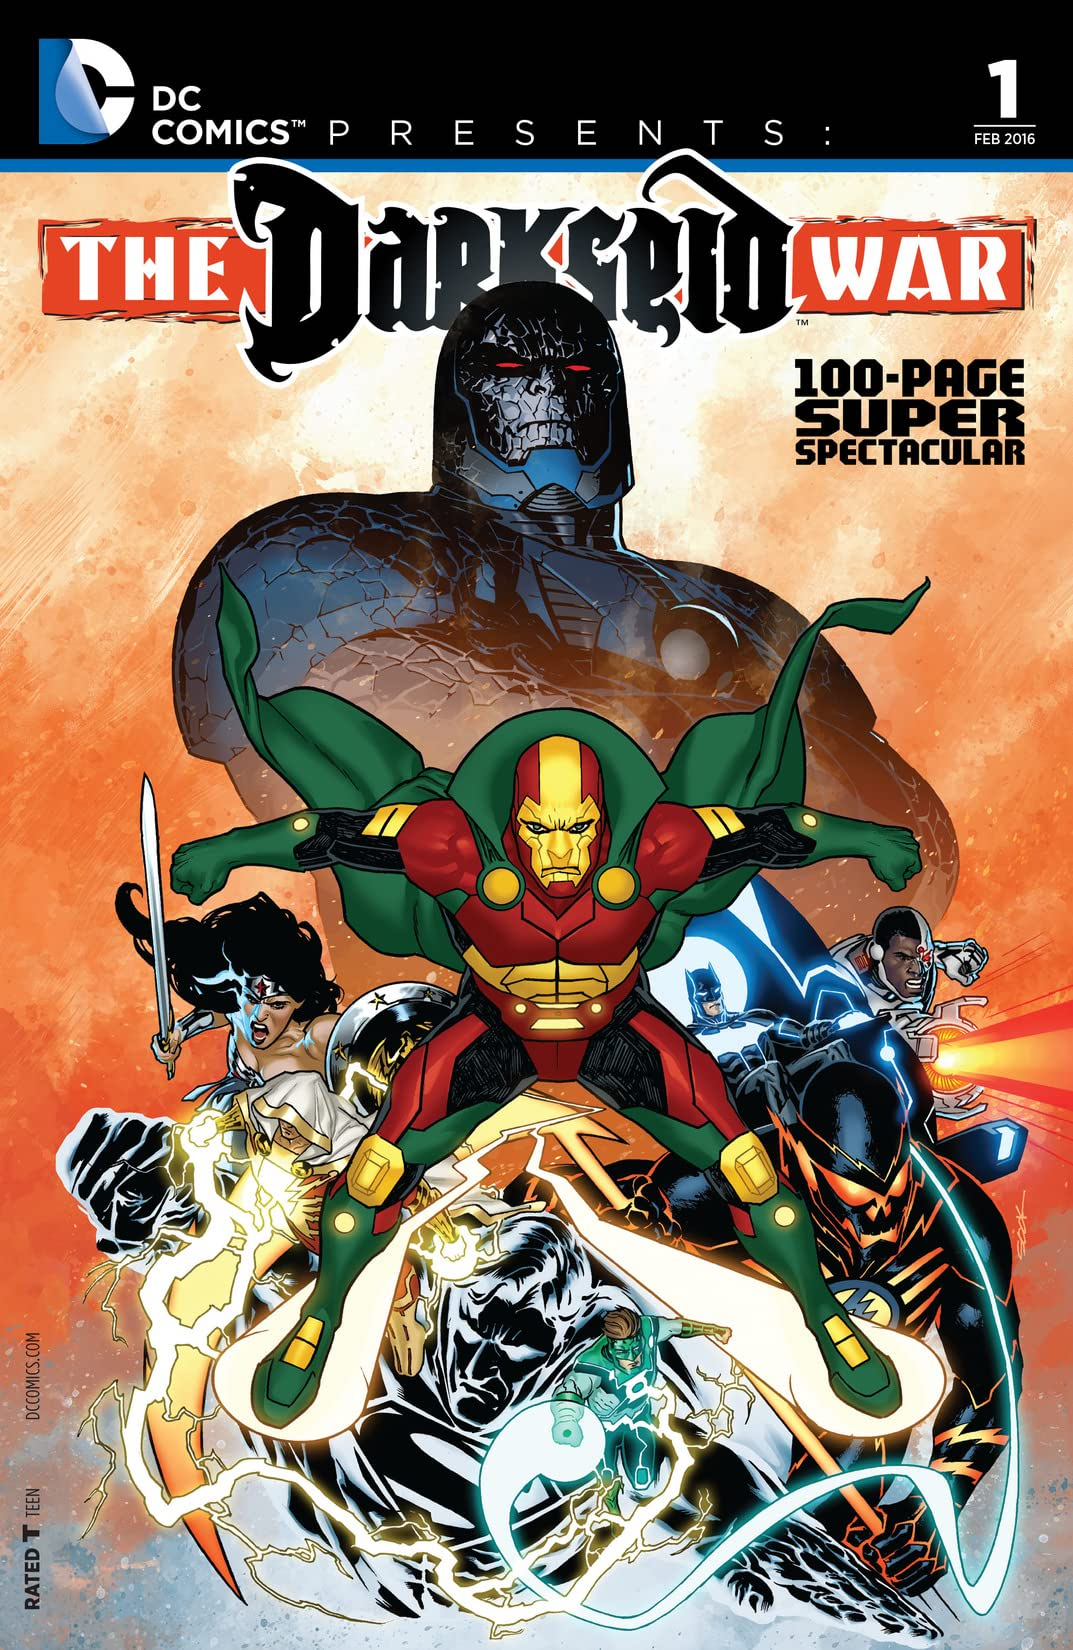 DC Comics Presents: Darkseid War 100-Page Spectacular (2015) #1